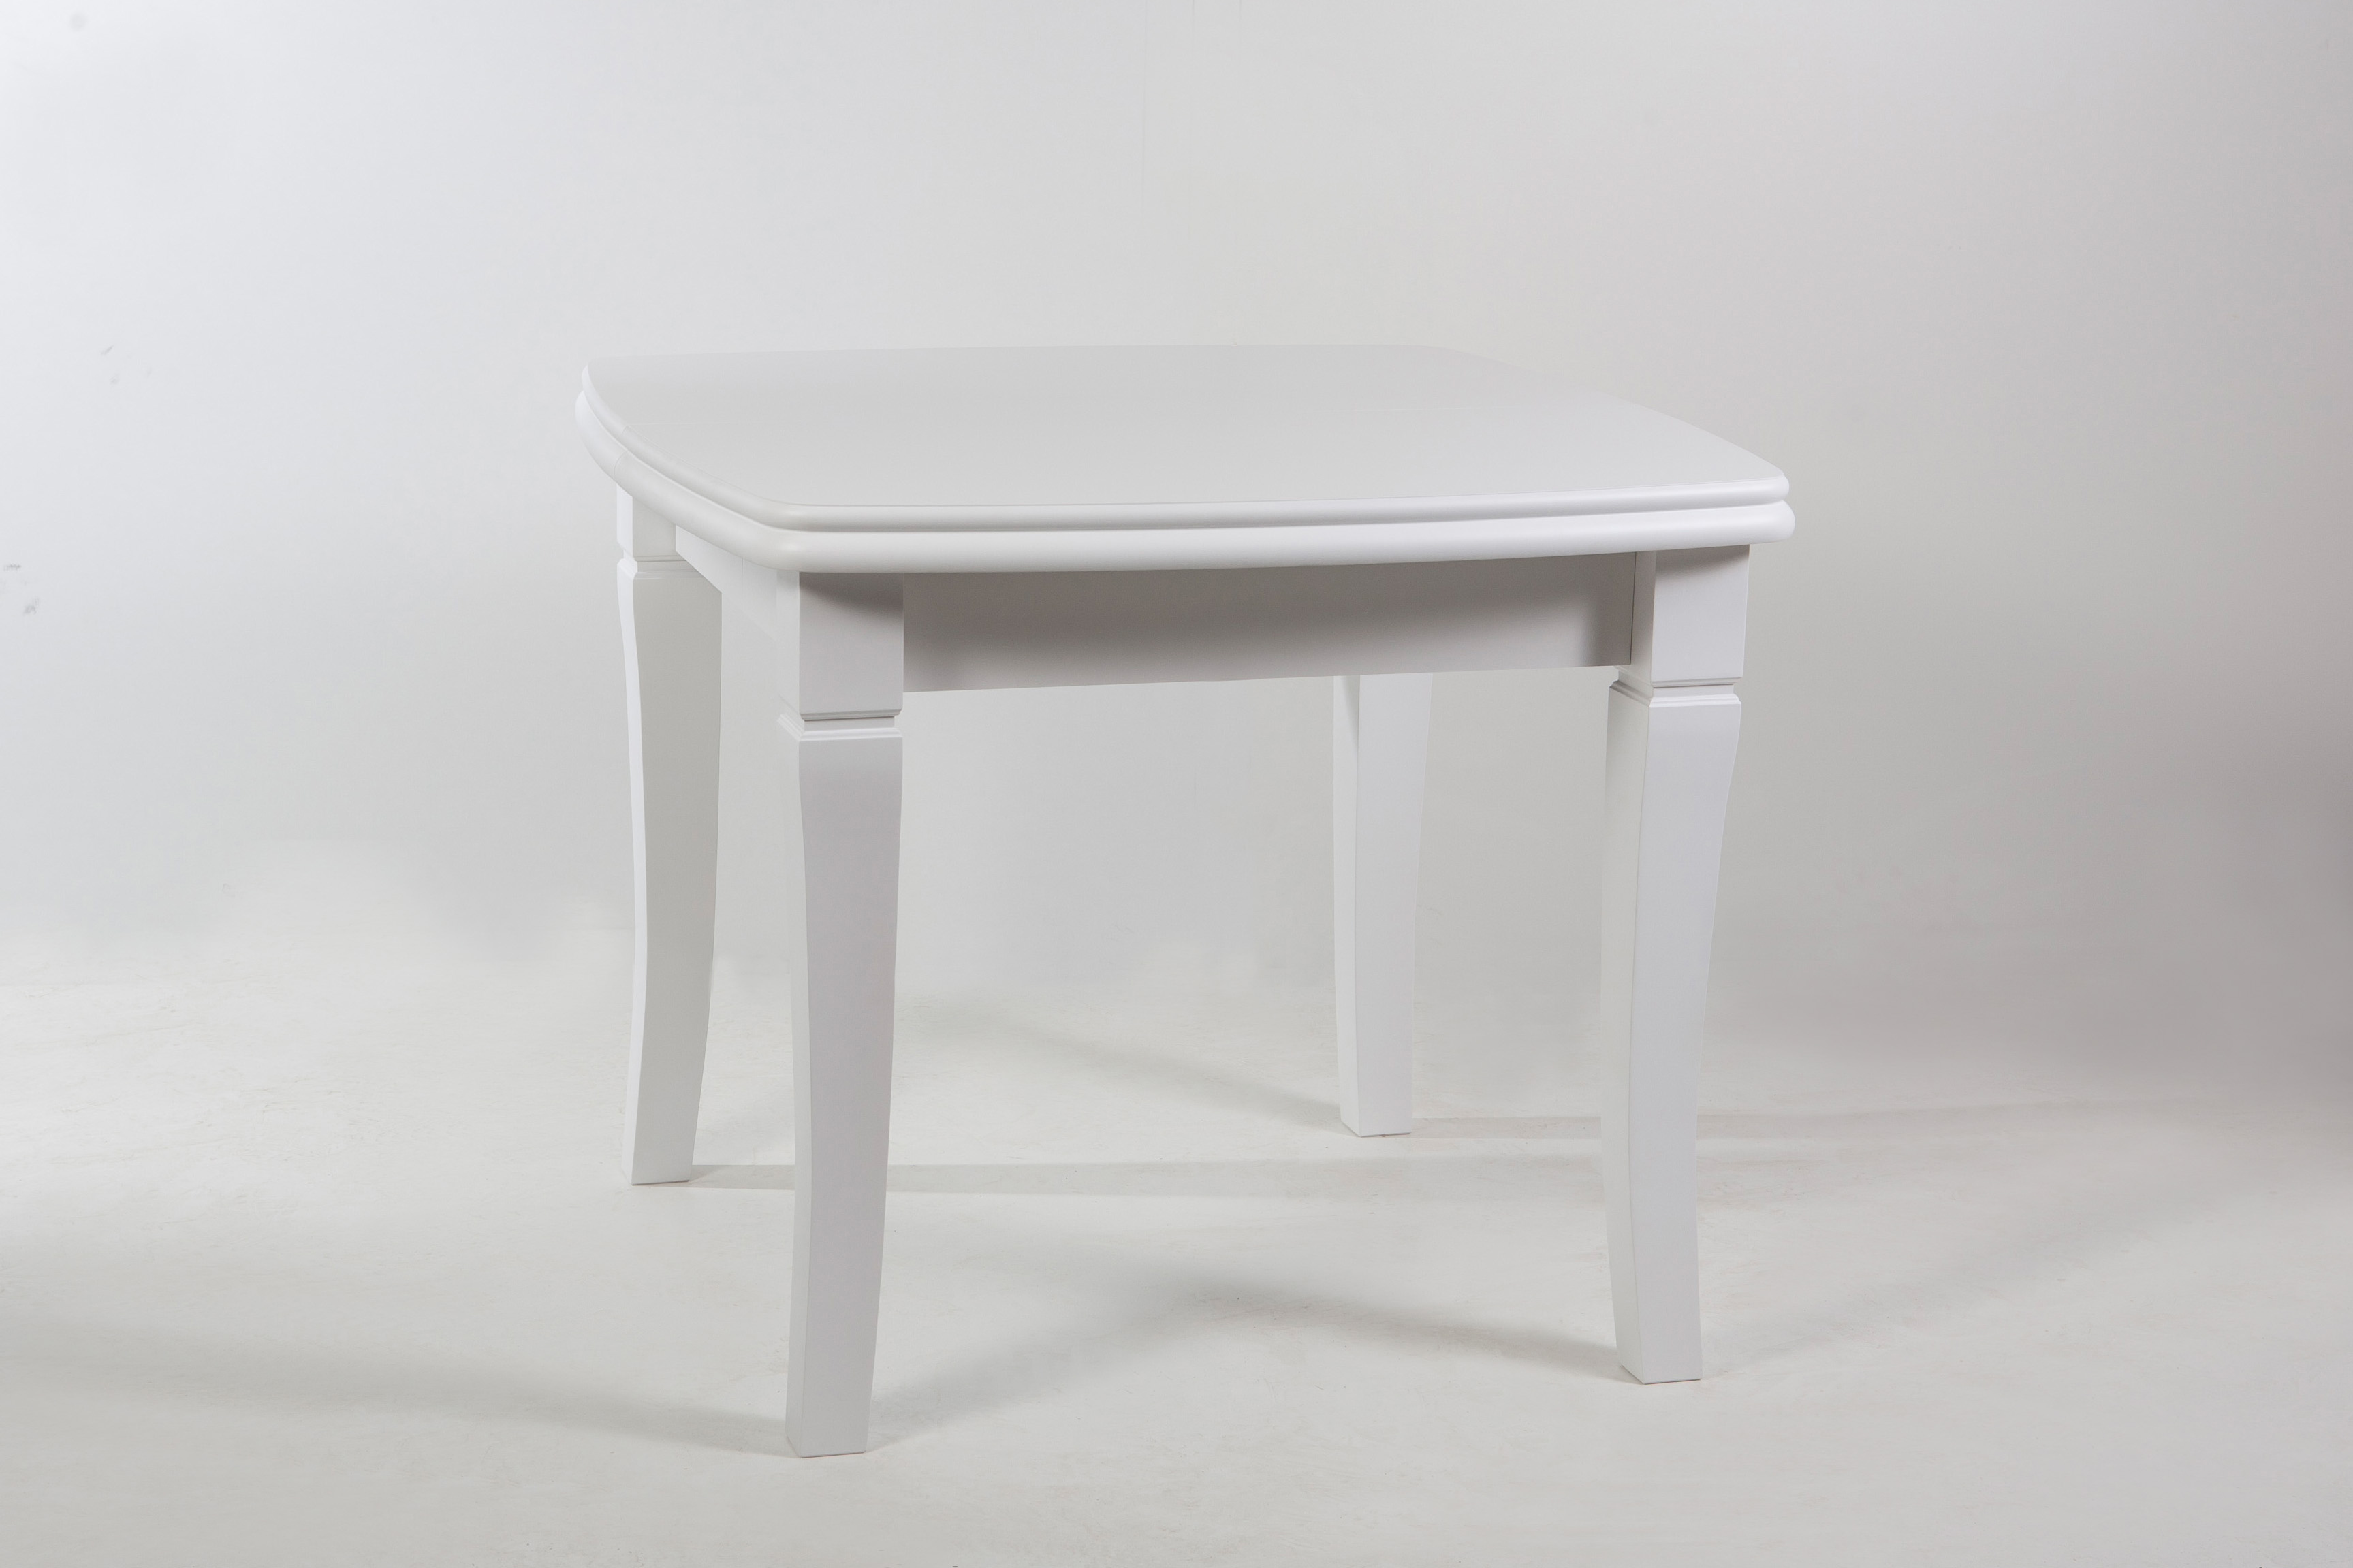 Table Monte Carlo